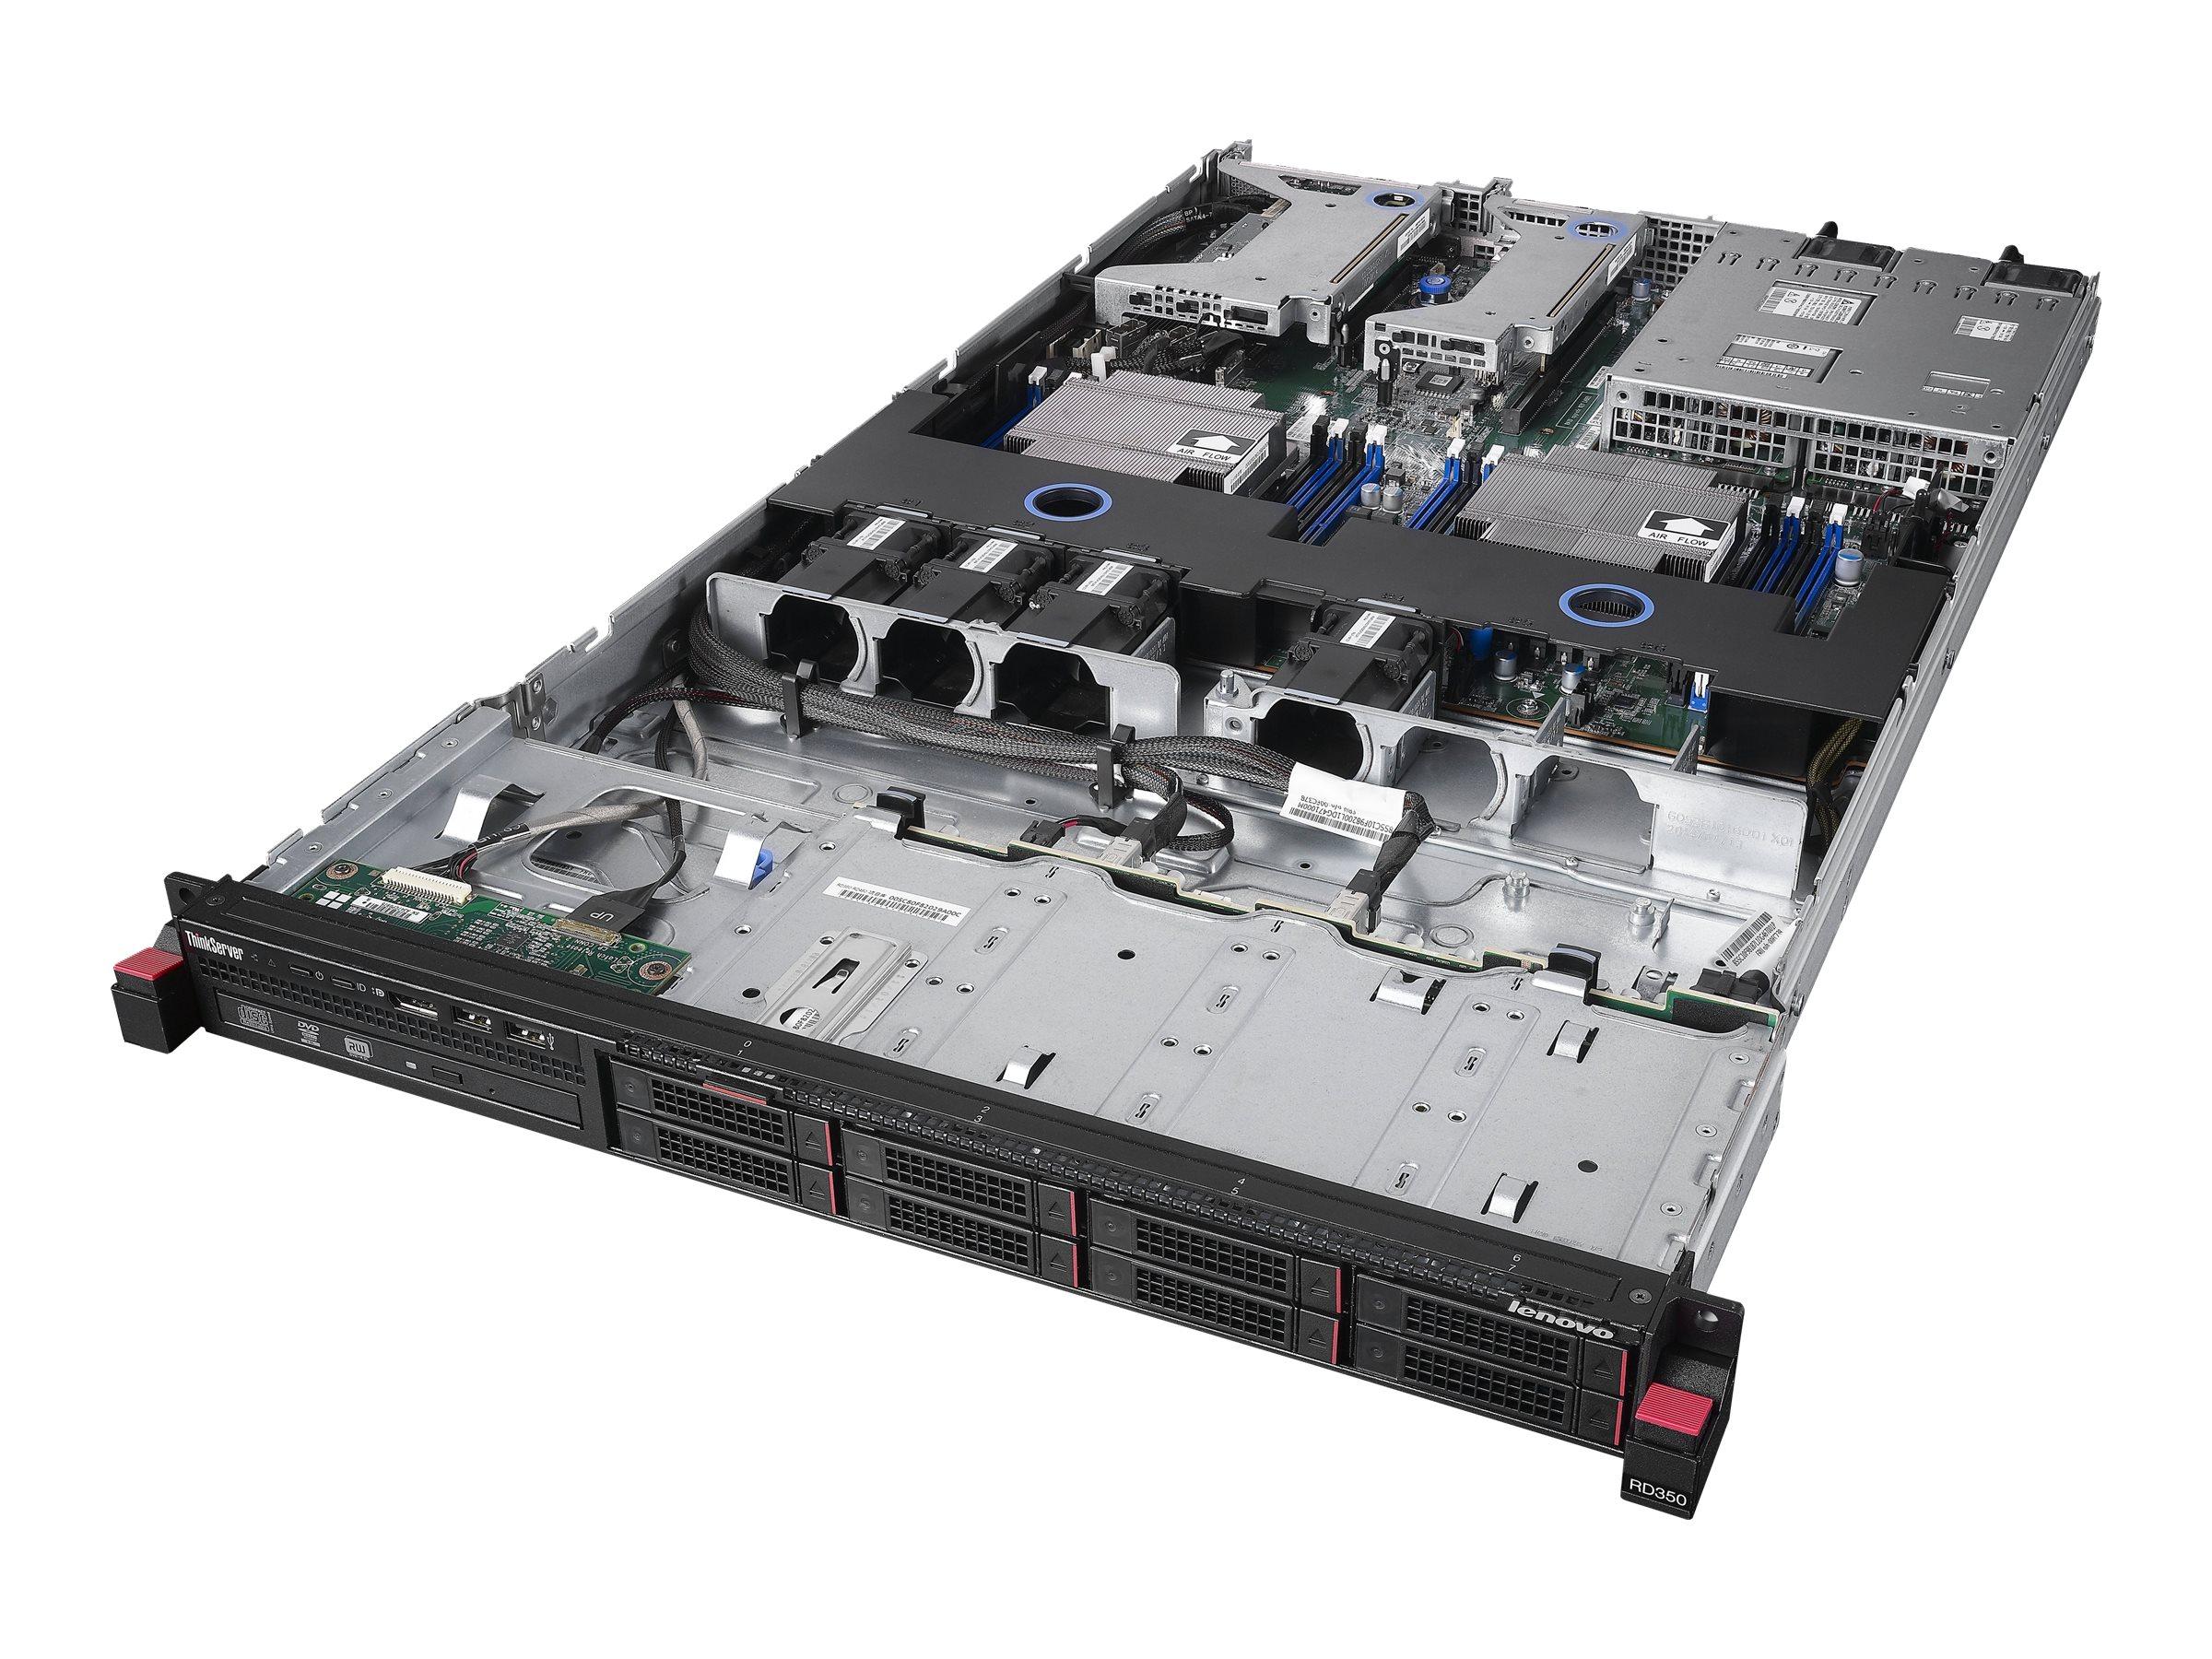 Lenovo Topseller Thinkserver Rd350 Intel 16ghz Xeon 70d8001tux V Gen Sdhc Card 4gb